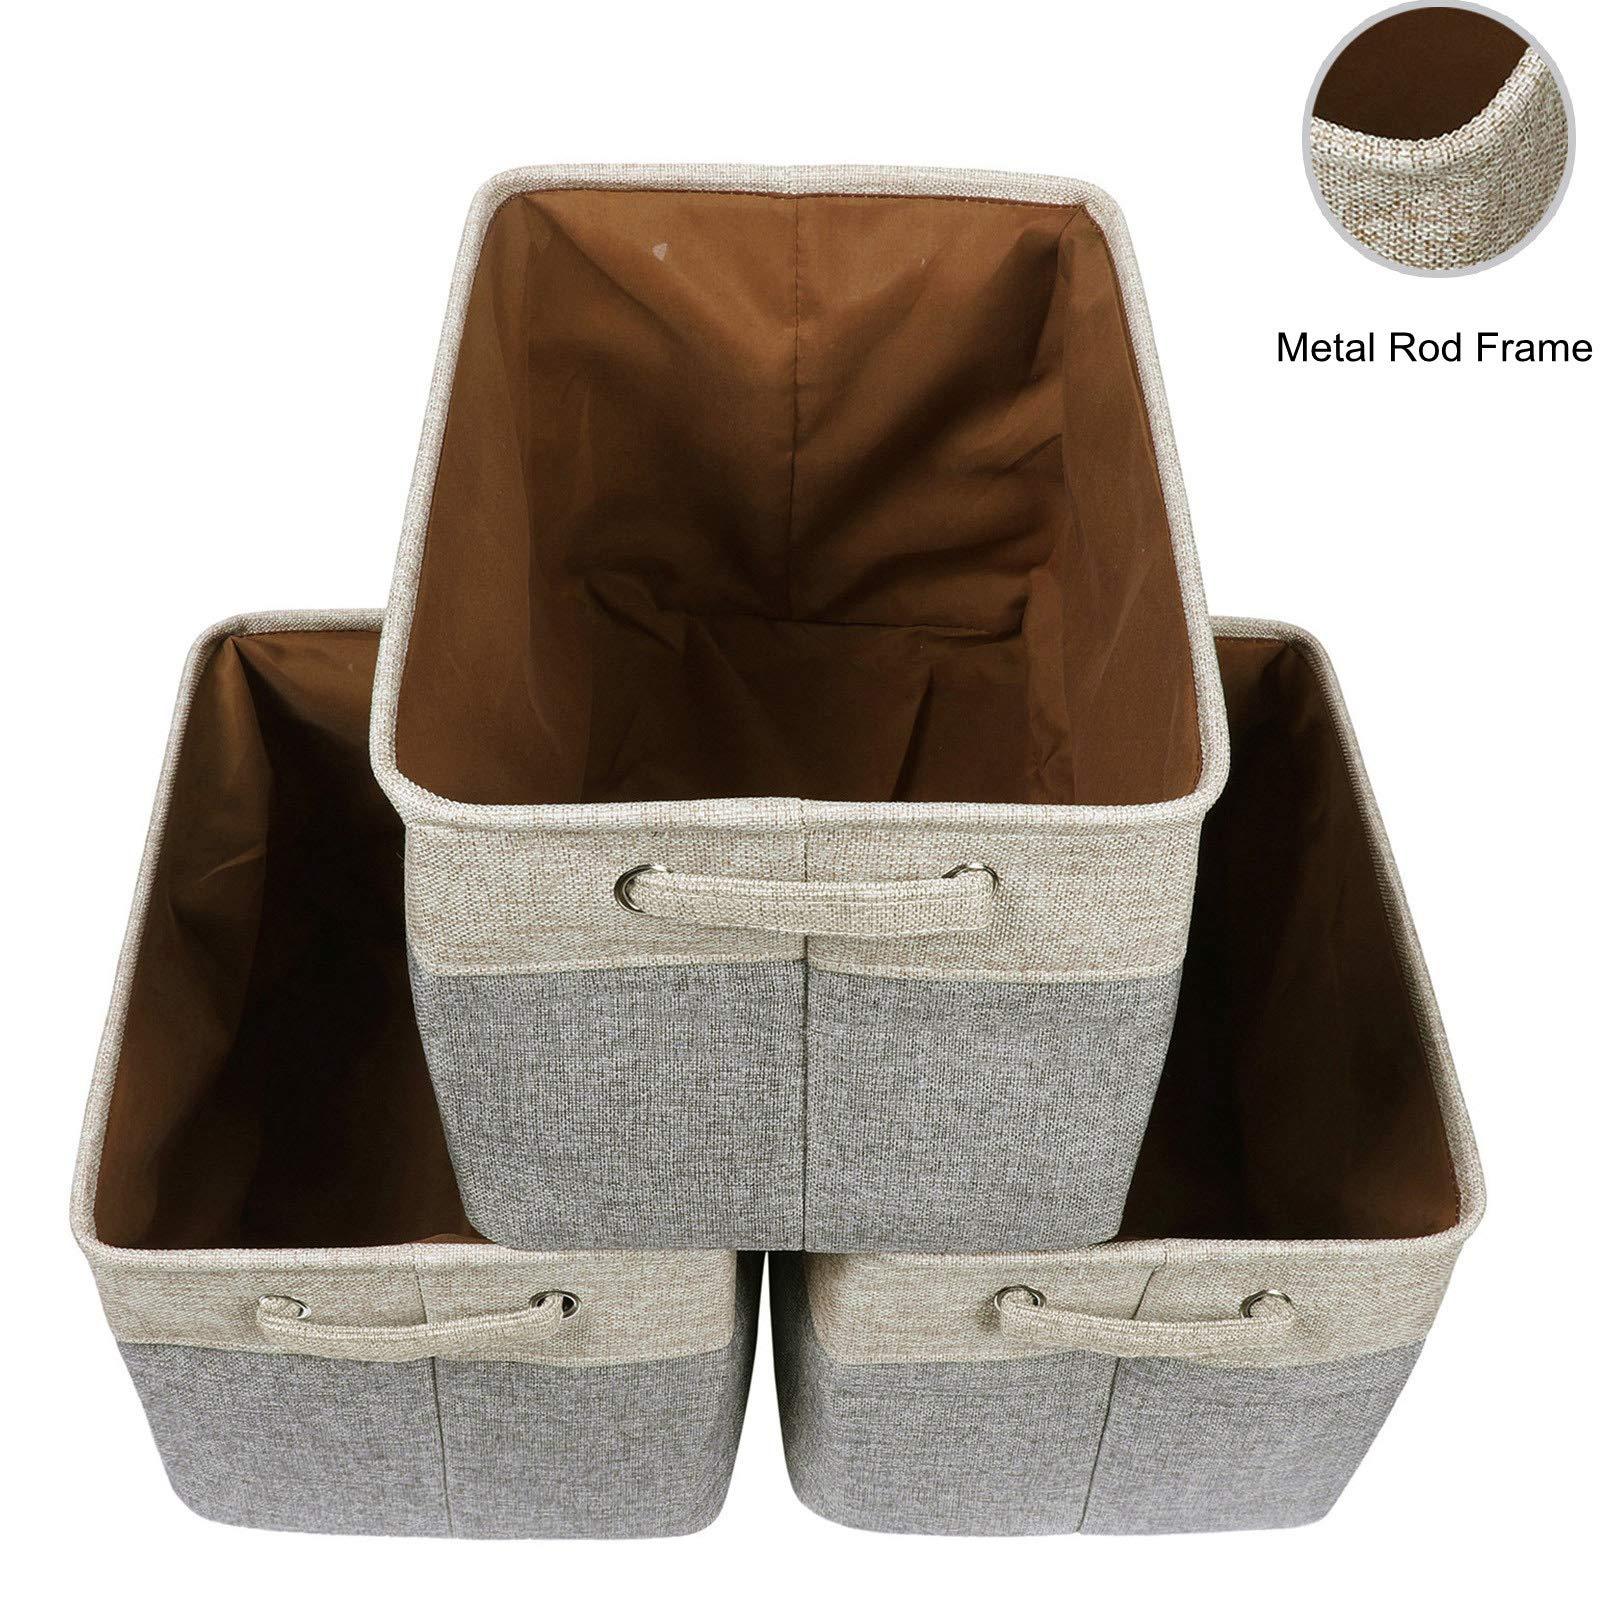 Foldable Linen Canvas Storage Baskets - Storage Large Basket Set 3pack Carry Handles Bins Organizer, for Nursery Home Shelves and Office (Khaki/Gray, 15''L x 10.6'' W x 9.4'' H)